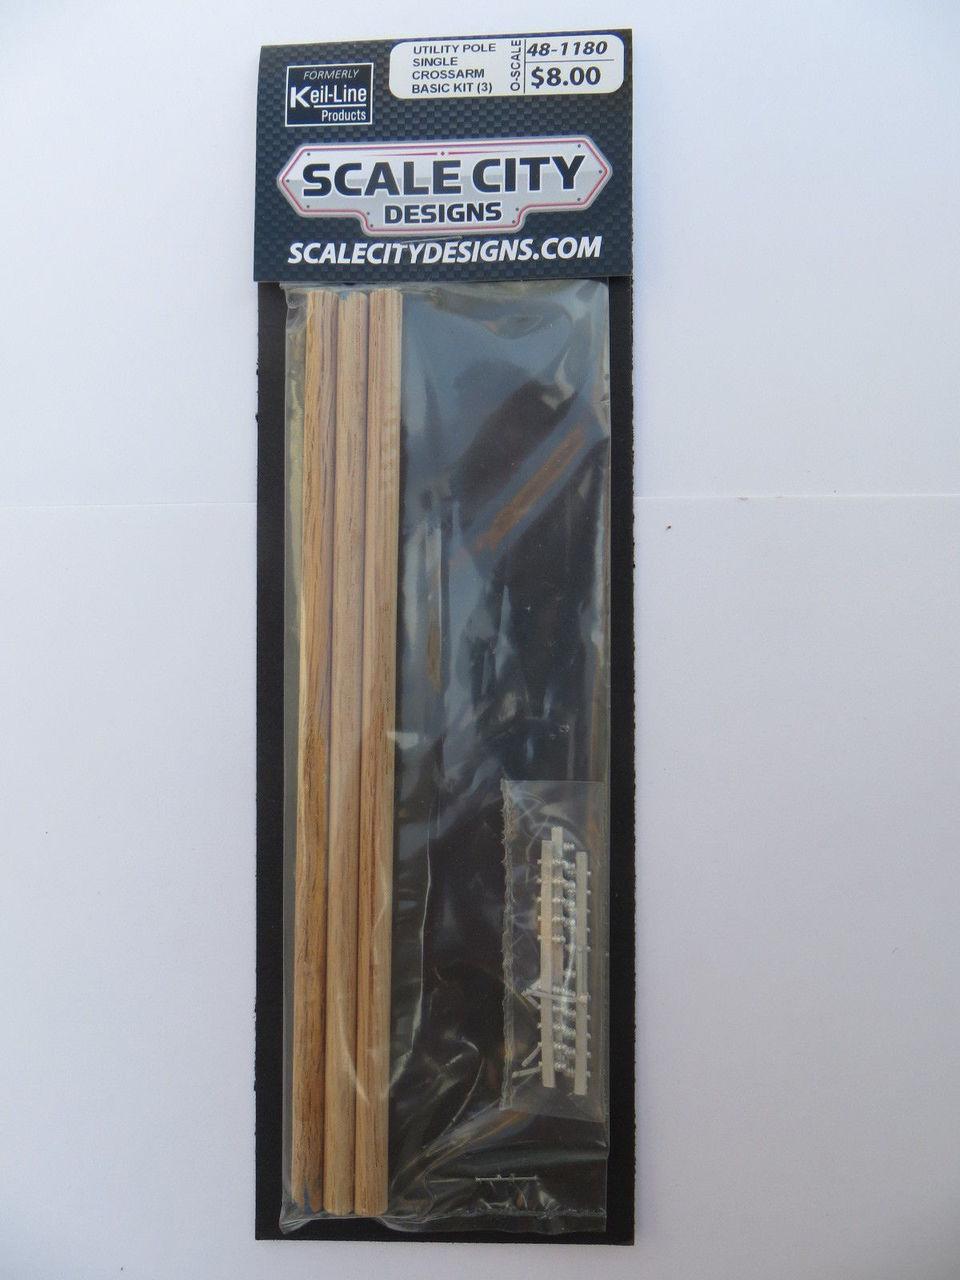 48-1180 Utility Pole Single Crossarm Basic Kit Electric Telephone O Scale QTY 3 FKA KEIL LINE